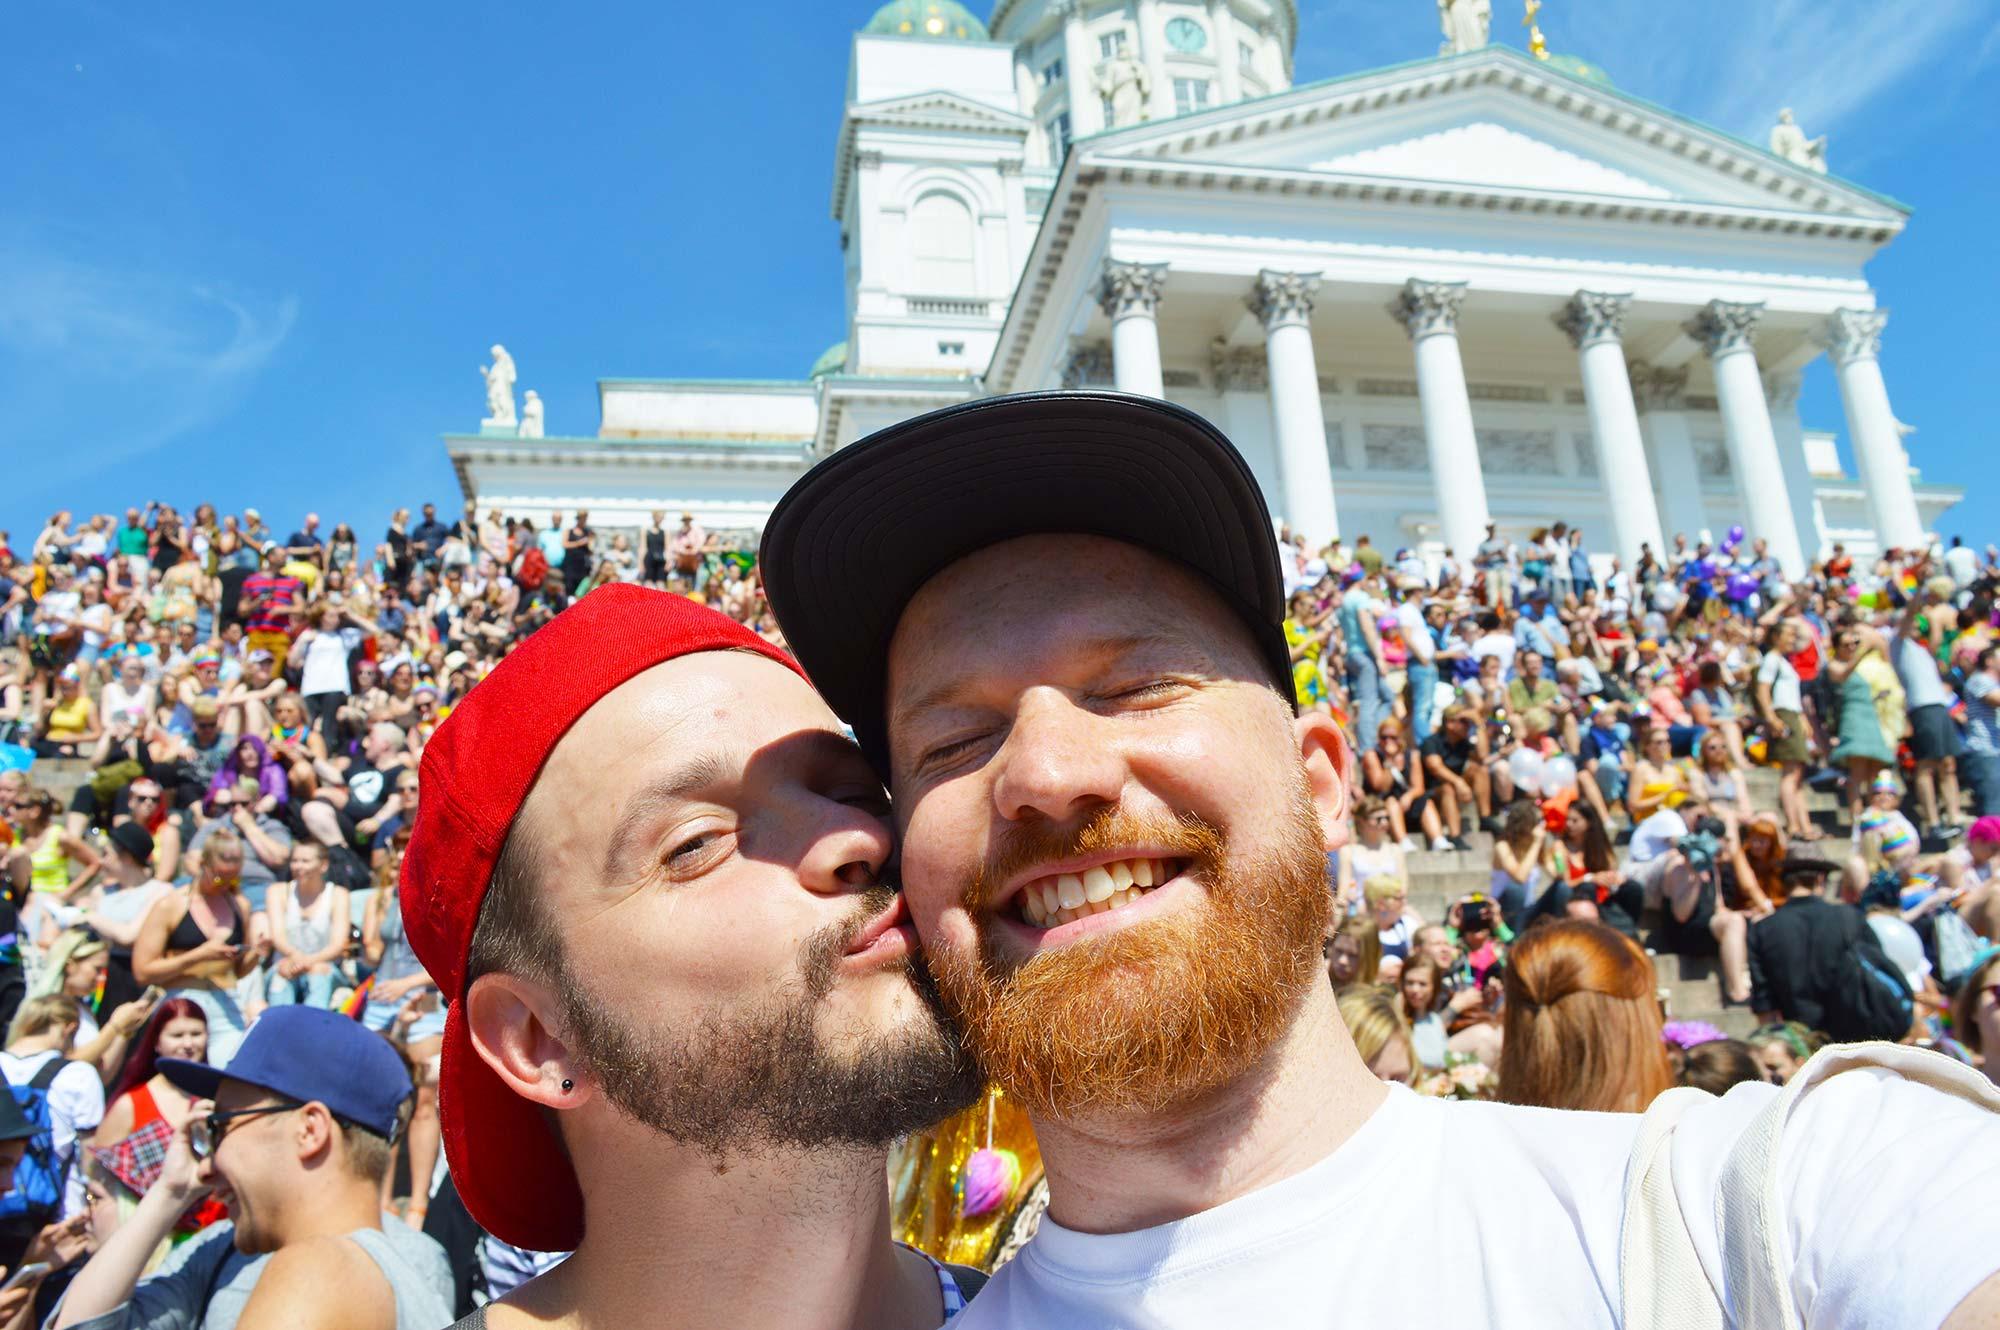 Gay Pride CSD Trips Gay Reiseblogger Couple of Men Gay Pride Trips Gay Pride Helsinki LGBTQ Festival Parade 2016 © CoupleofMen.com